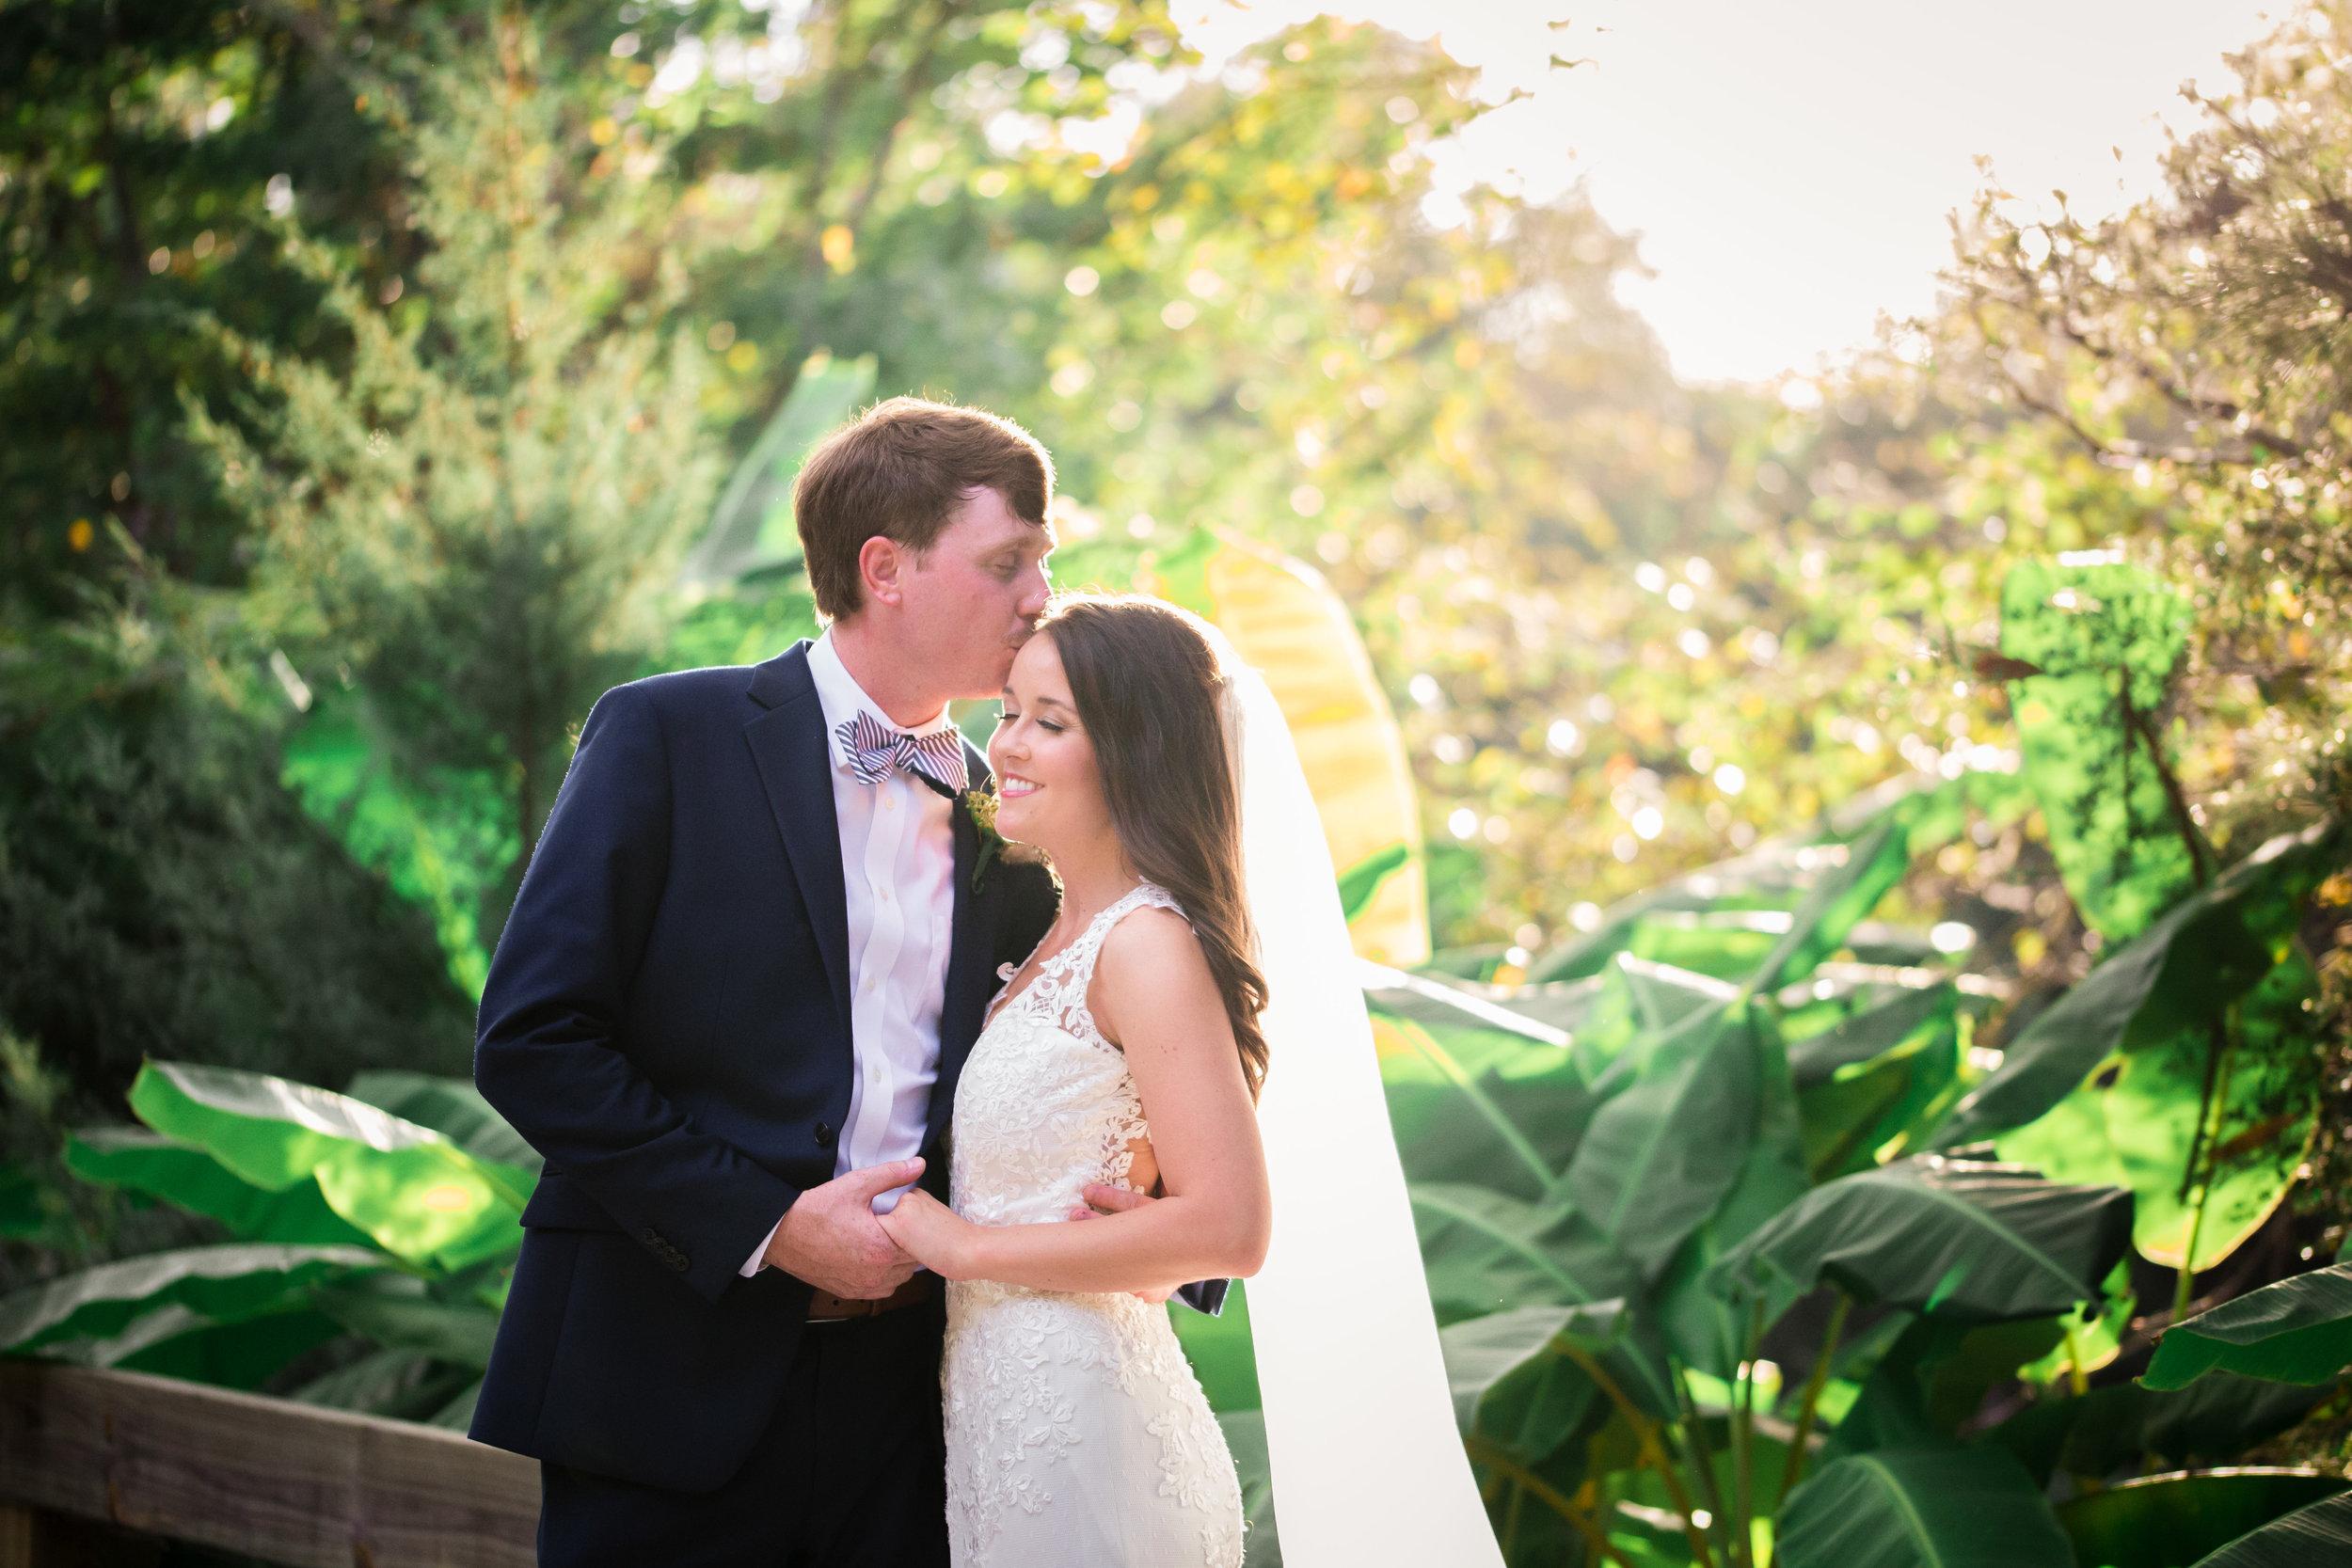 Bella-Sera-Gardens-Alabama-Mobile-Photography-Pensacola-Navarre-Fairhope-Wedding-28.jpg